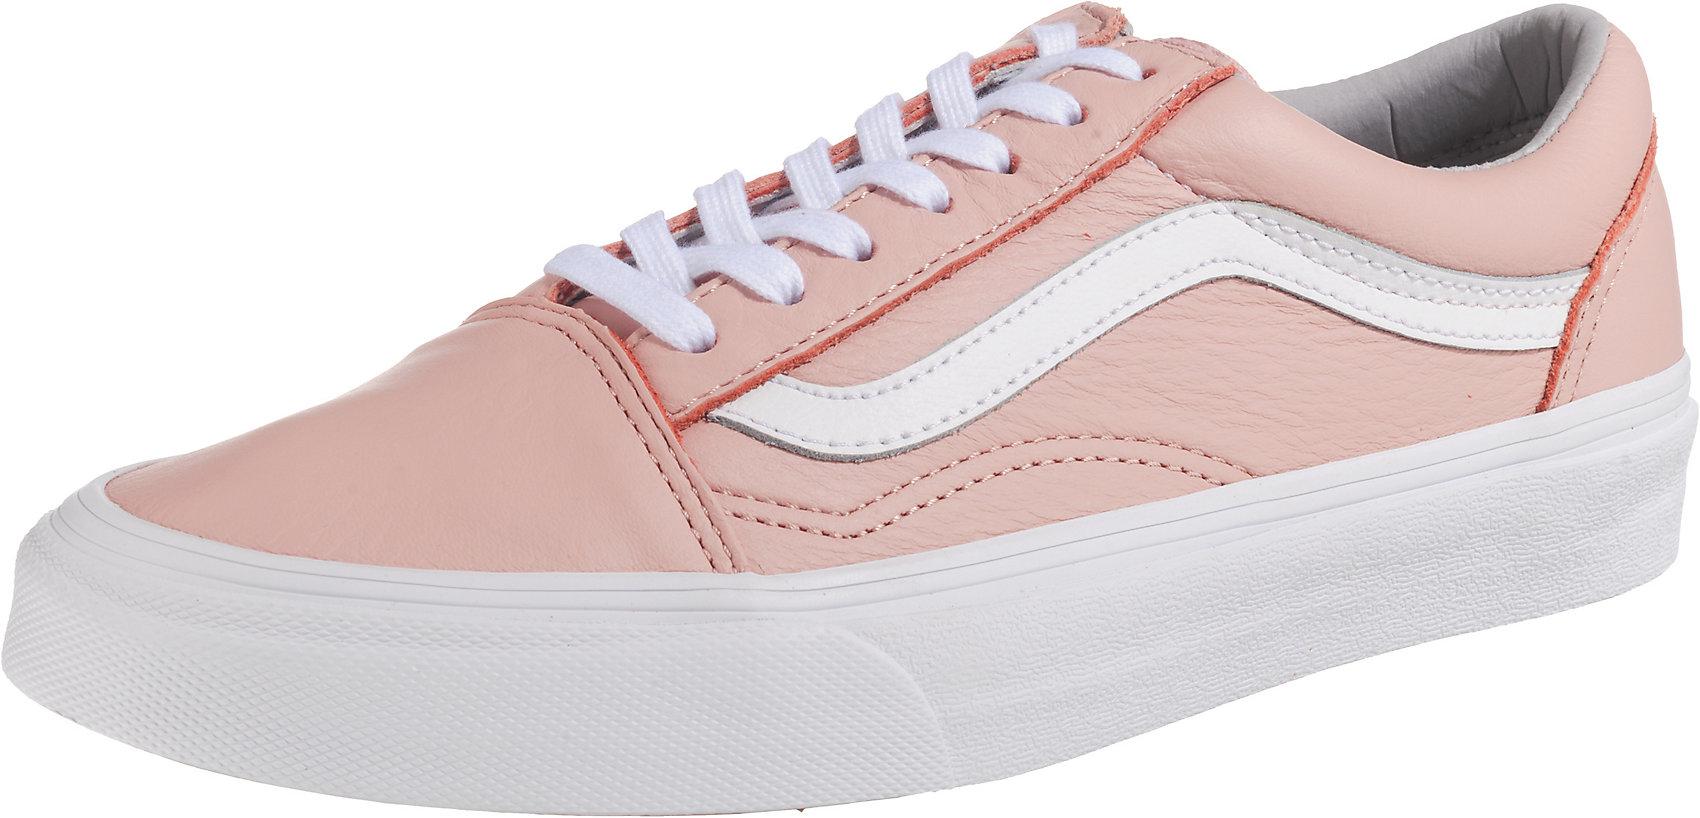 Details zu Neu VANS UA Old Skool Sneakers 7715830 für Damen rosa